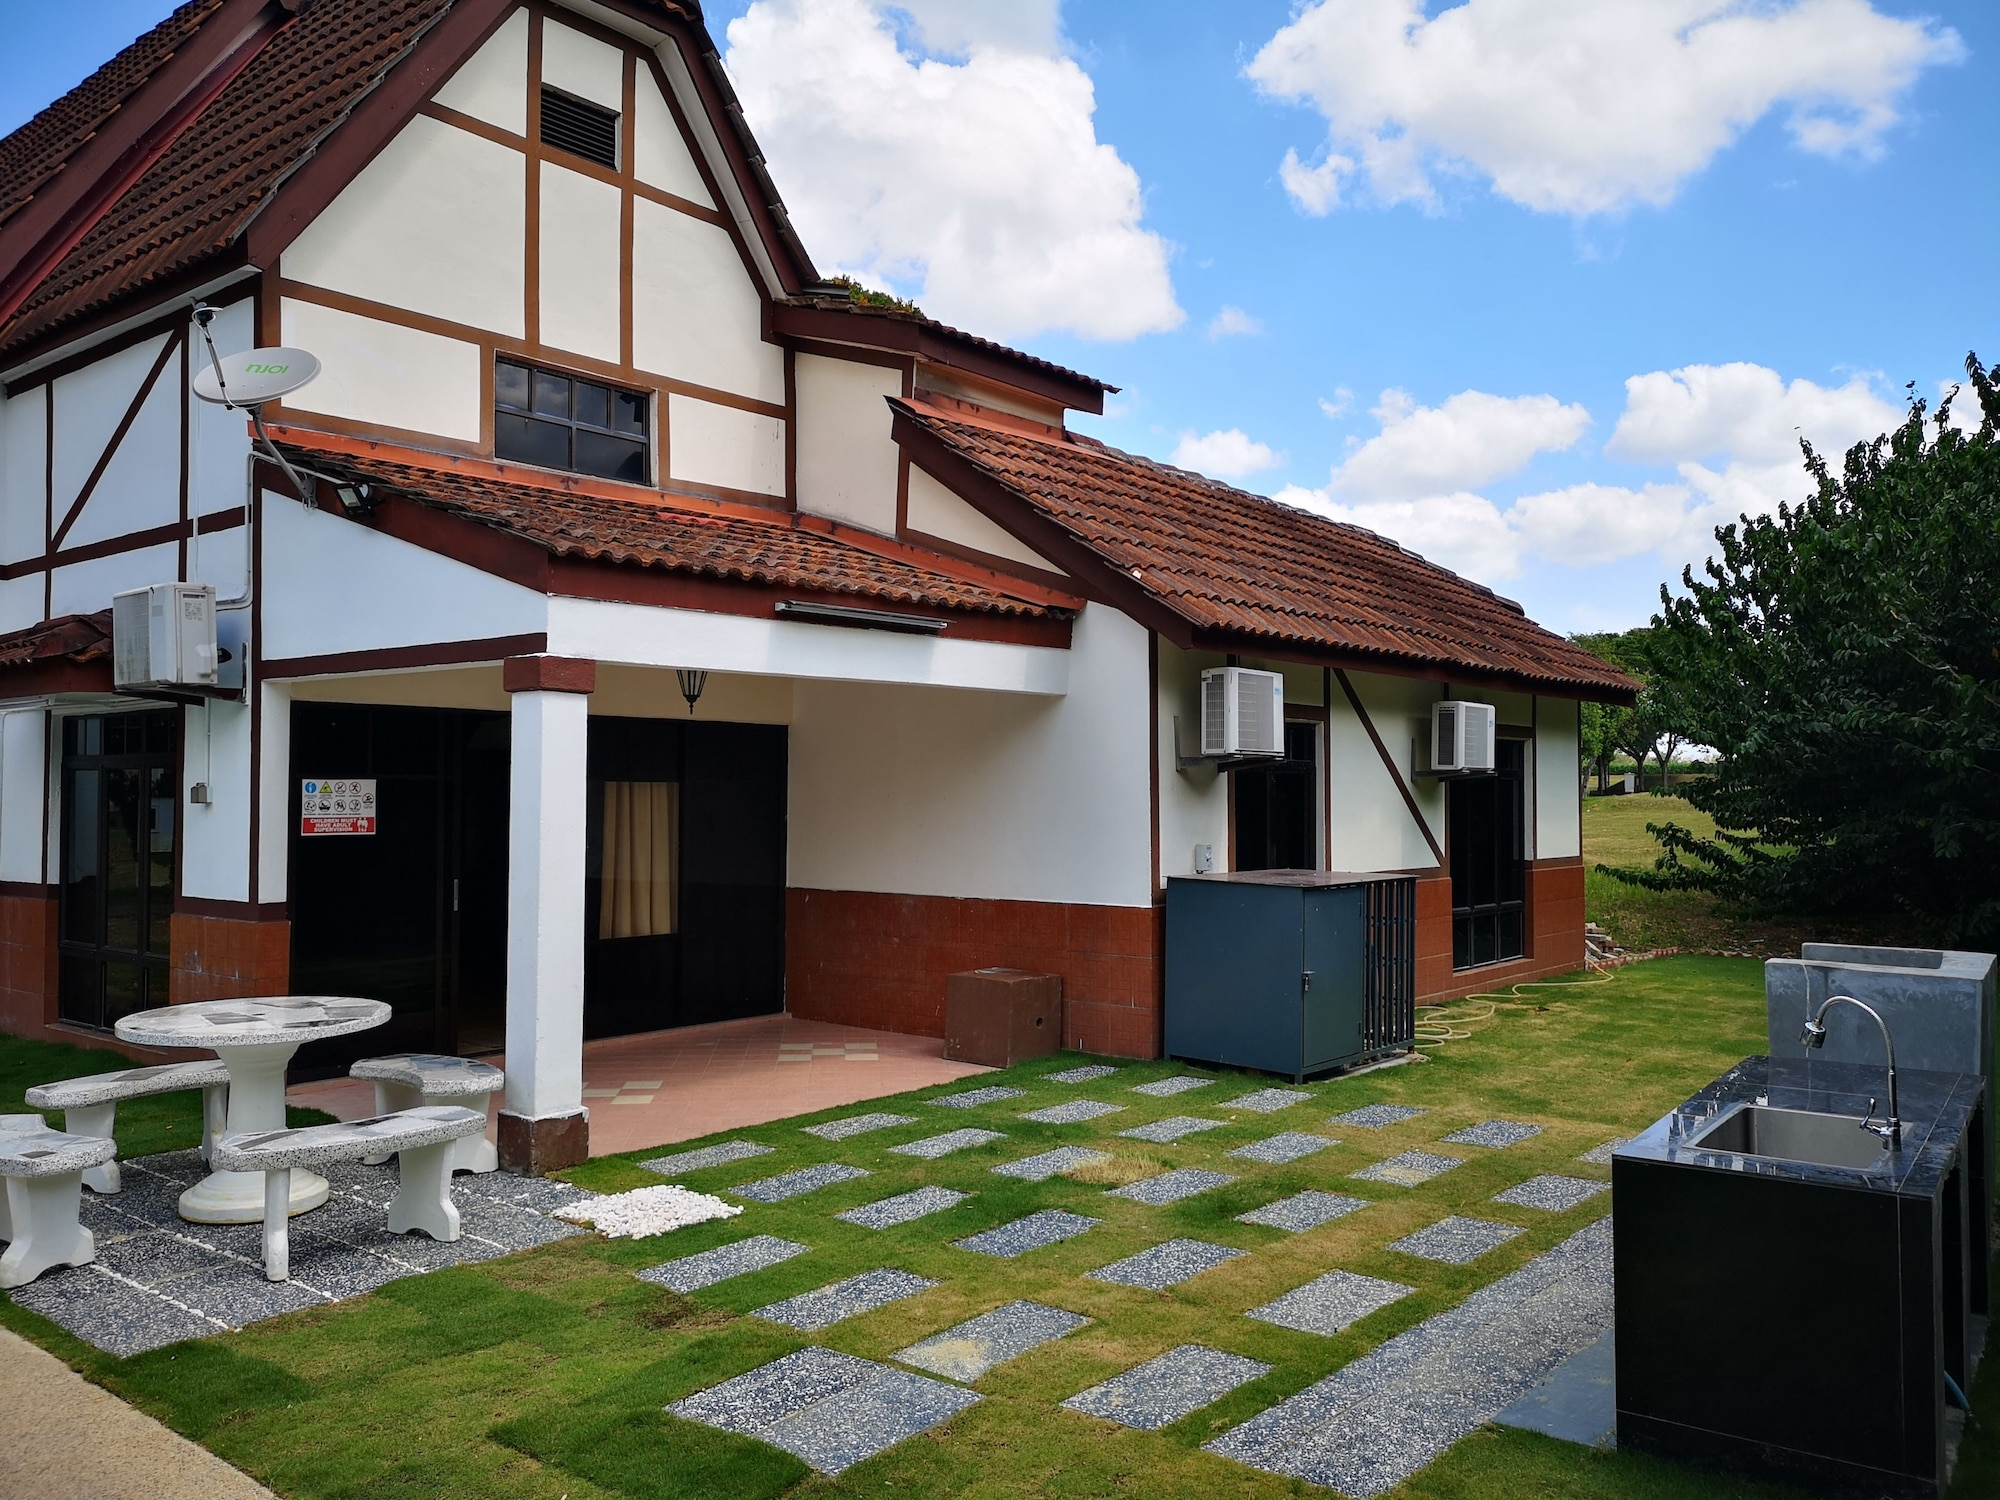 Luxury Villa 1069, Alor Gajah